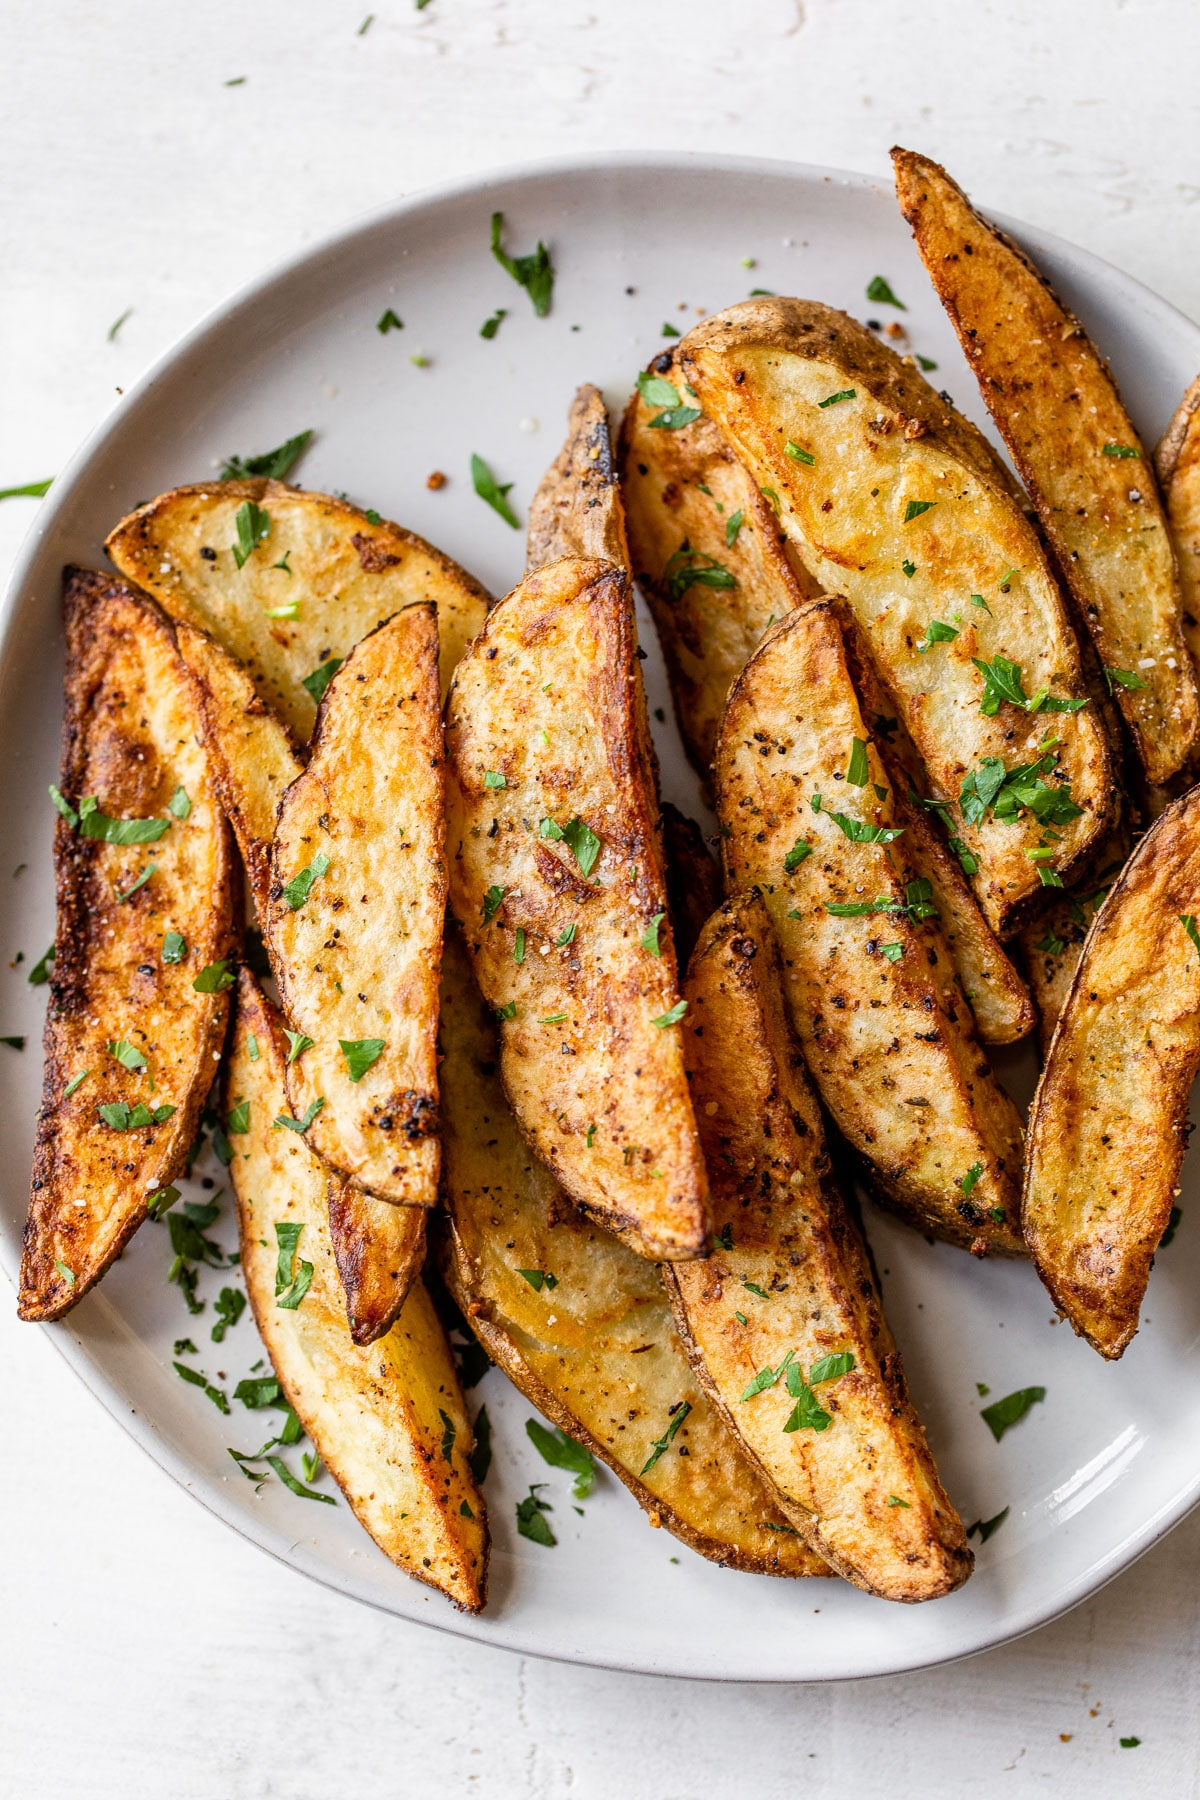 crispy seasoned potato wedges on a white plate